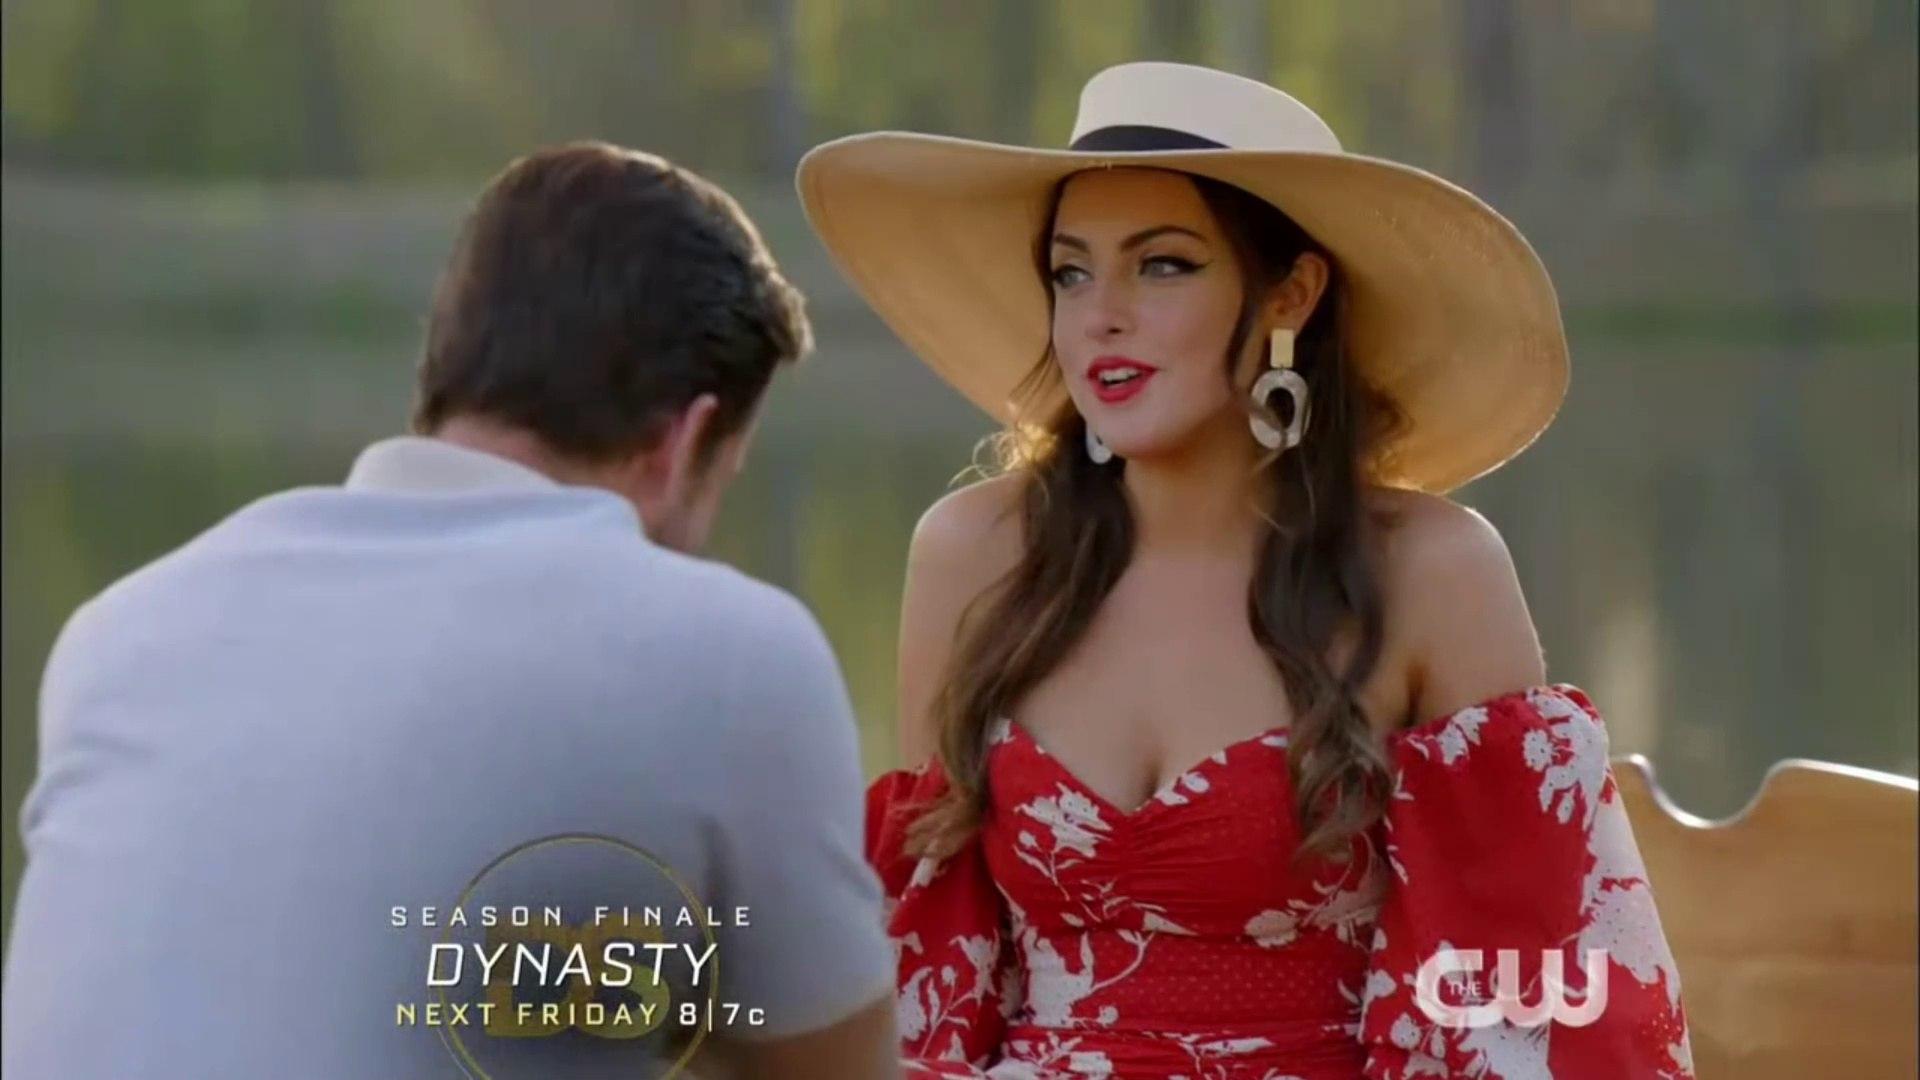 Ana Brenda Contreras Sex Video dynasty s02e22 deception, jealousy, and lies - season finale